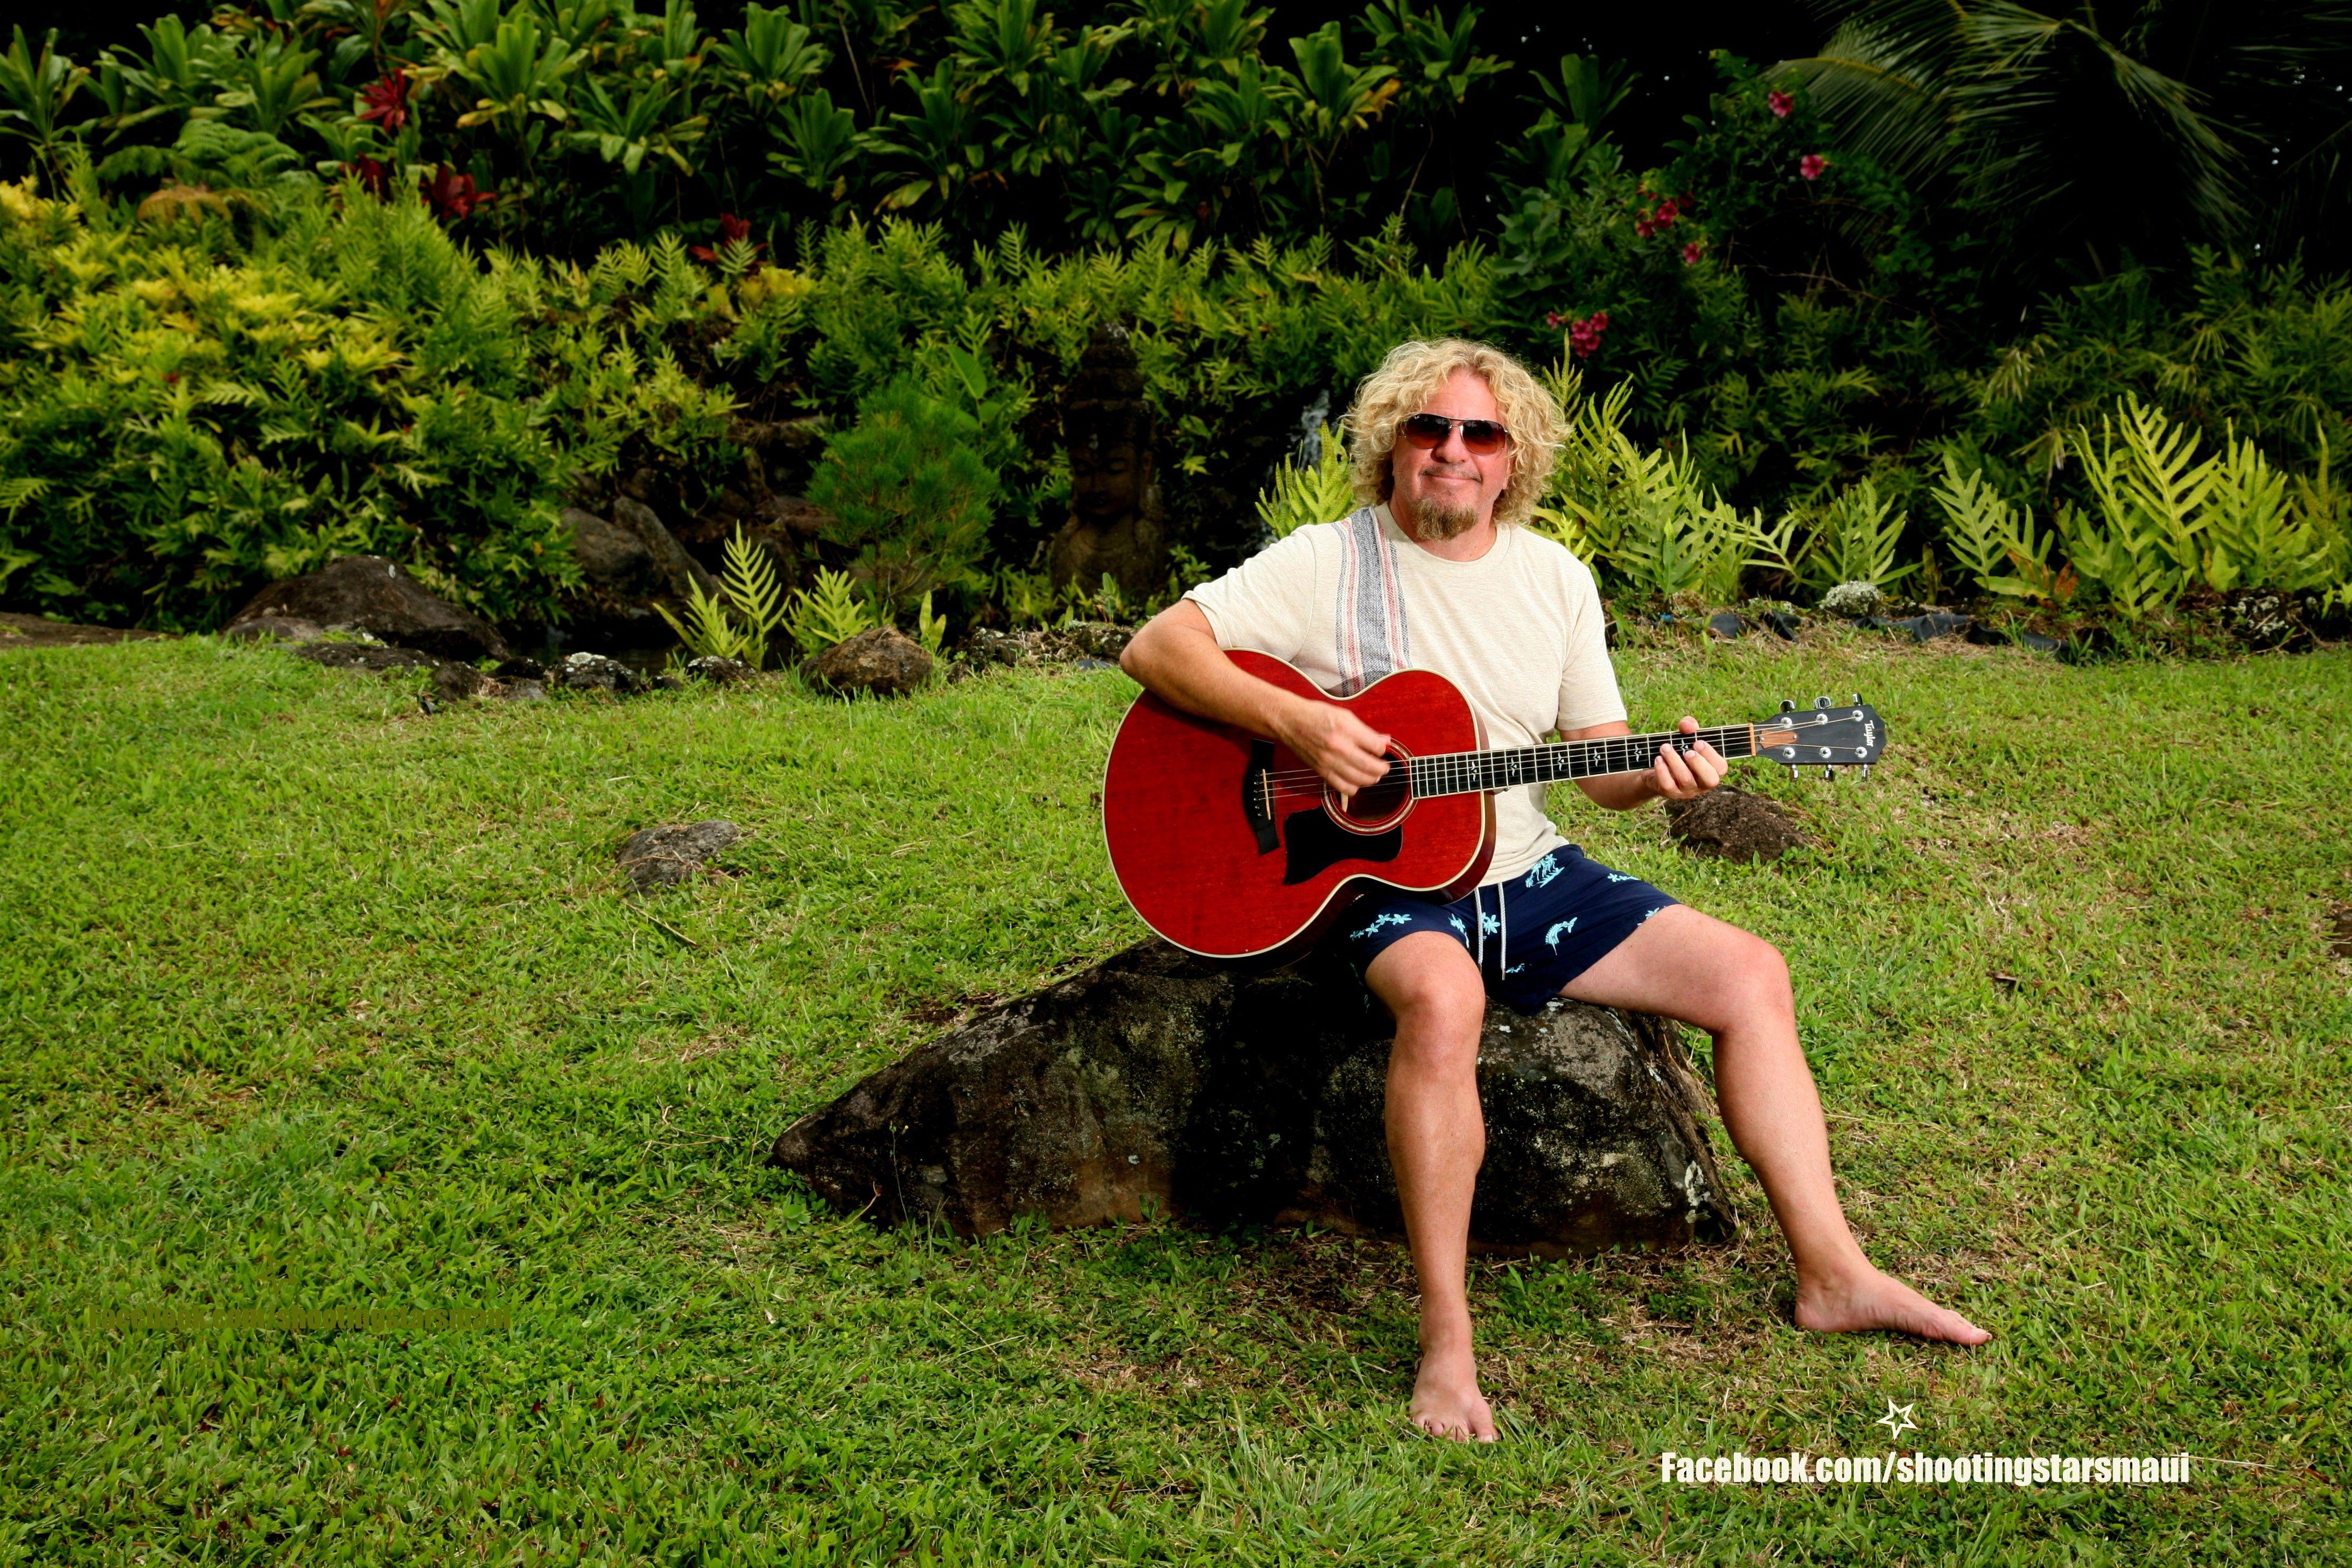 Sammy Hagar Workin On A Song In His Backyard On Maui Sammy Hagar Music Songs